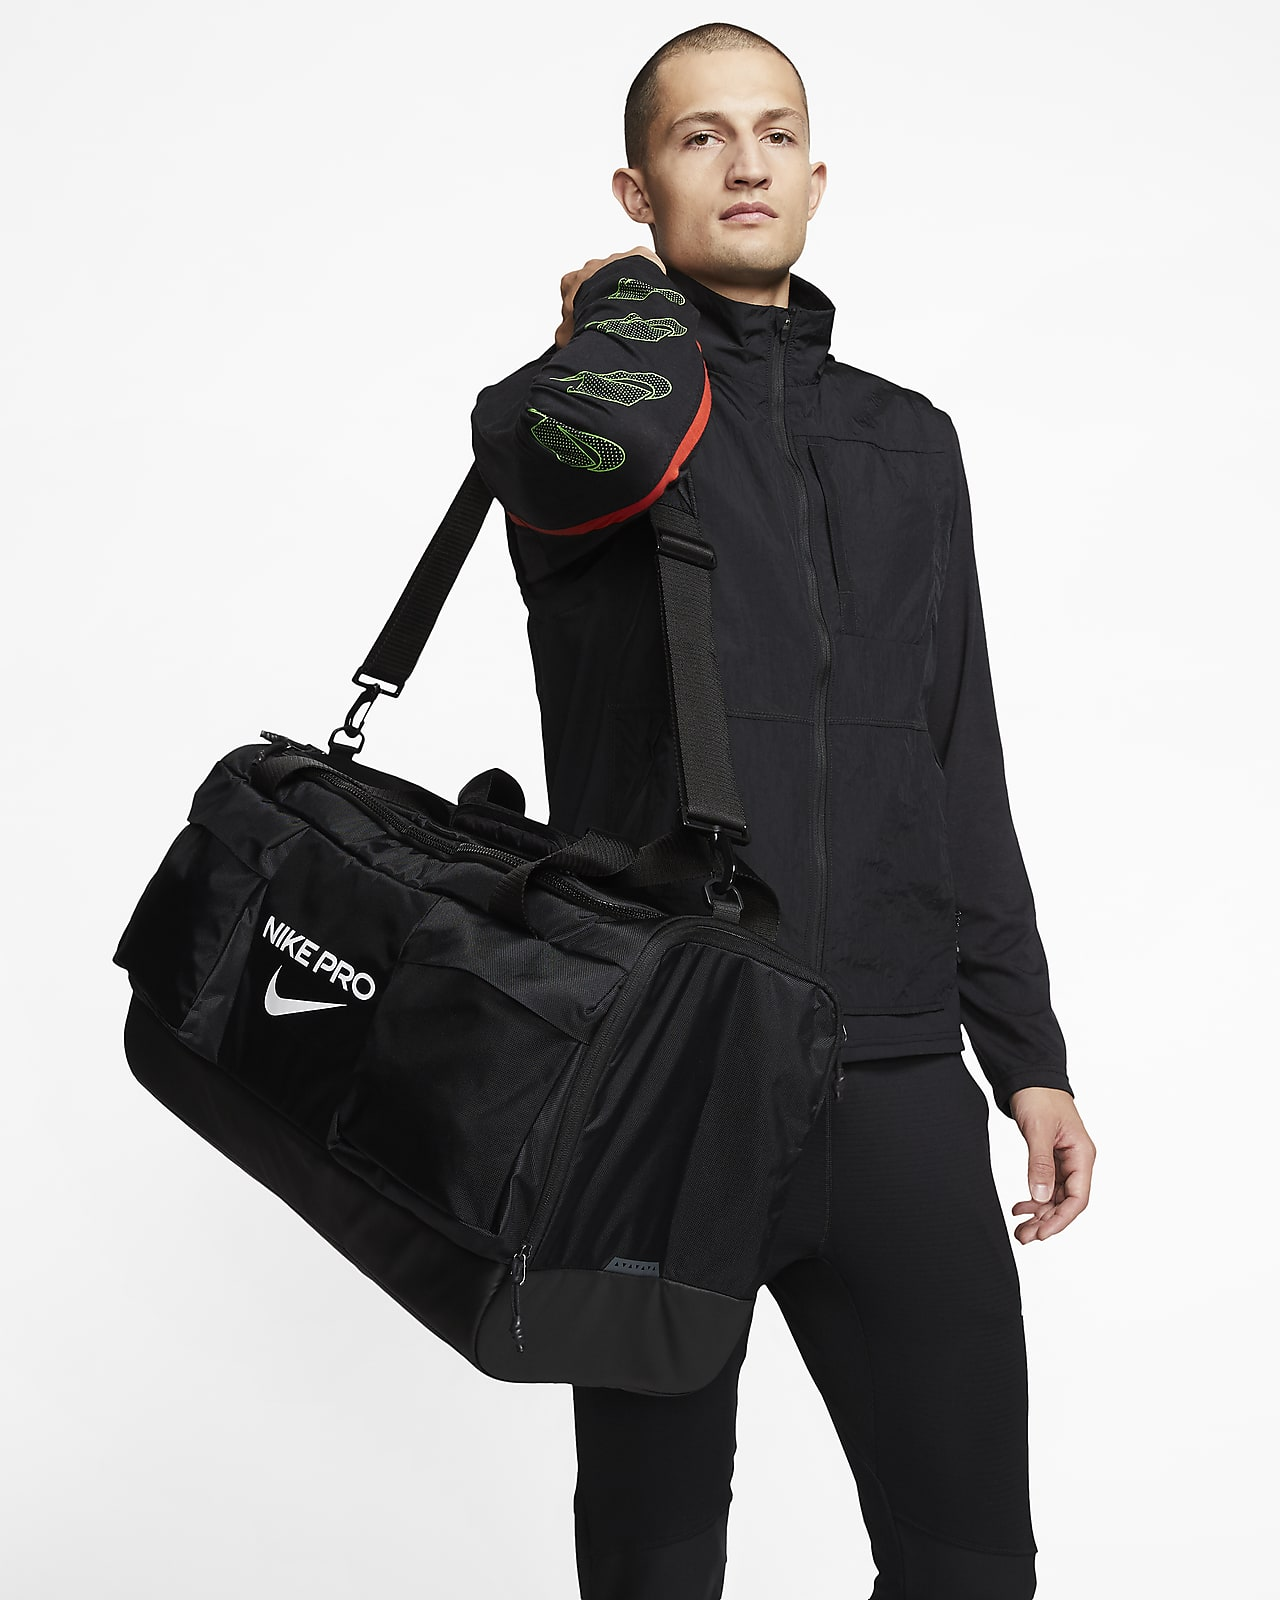 Sac de sport Nike Pro Vapor Power (format moyen)